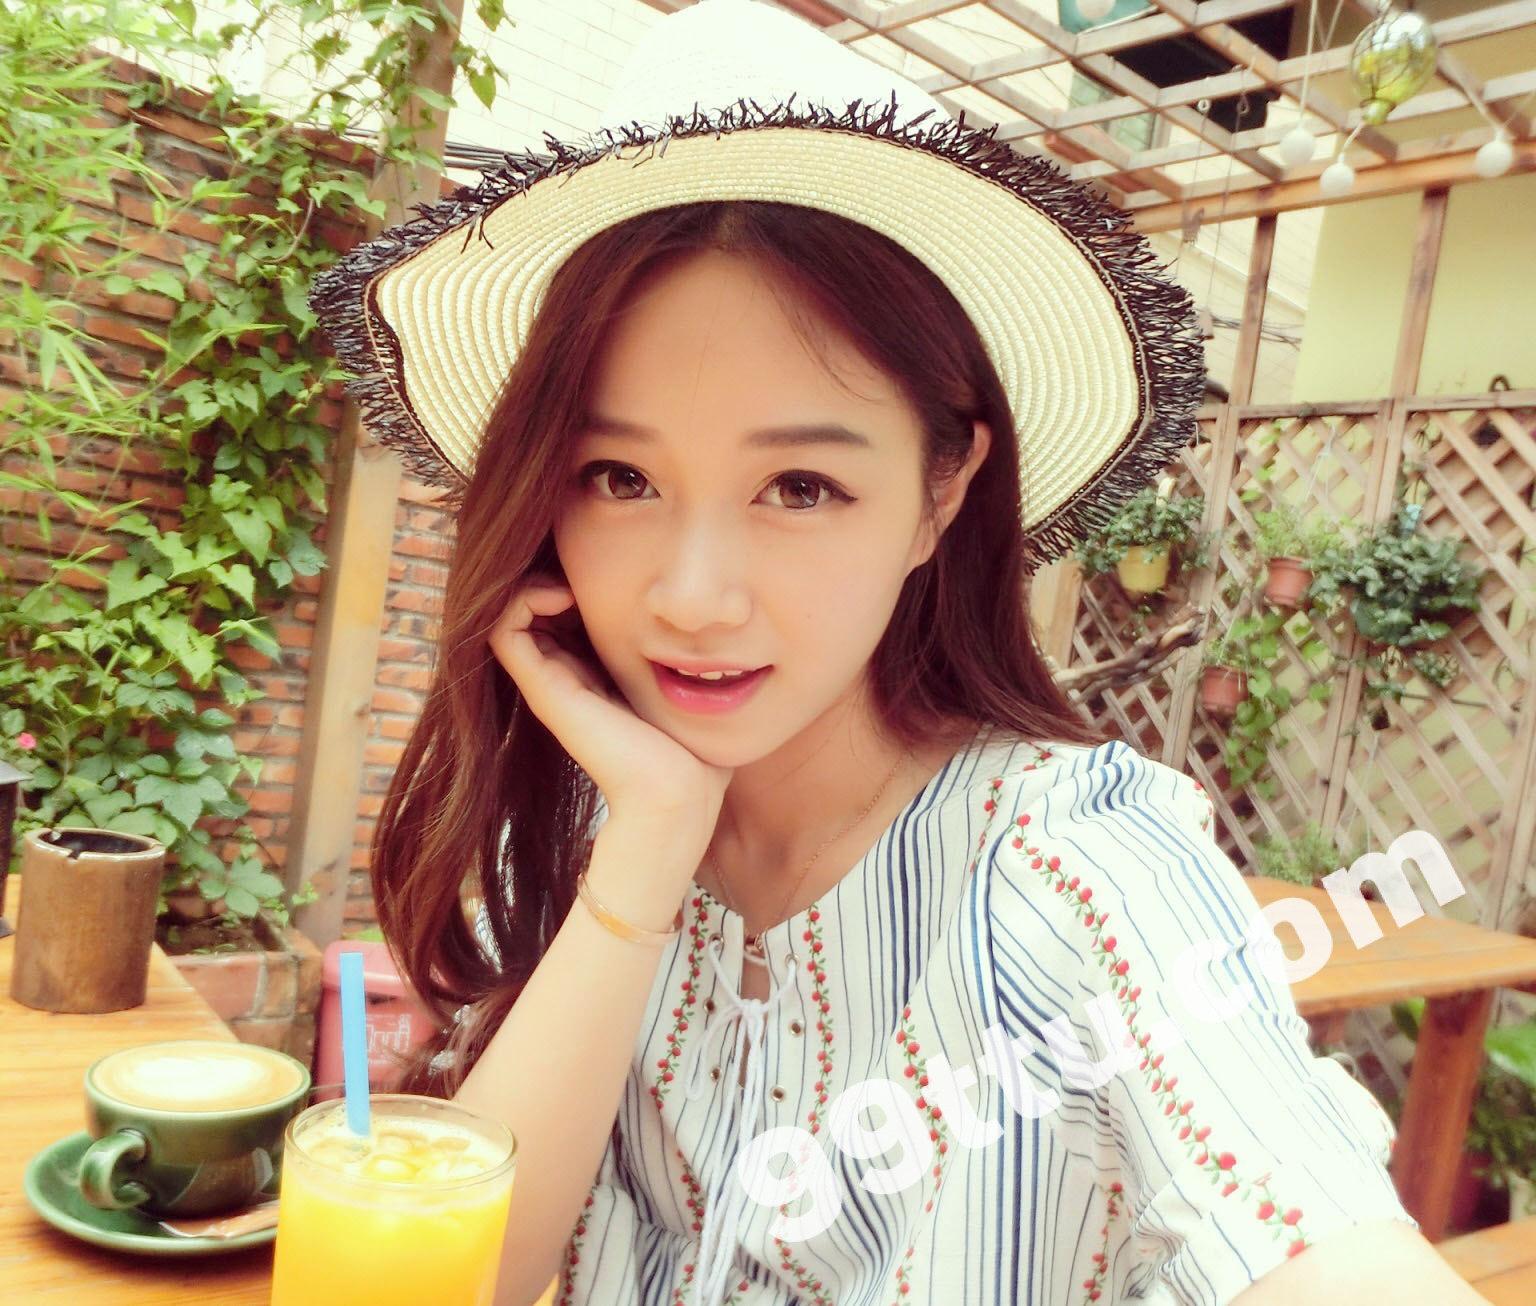 KK38 517张 时尚美女达人照片生活照-5